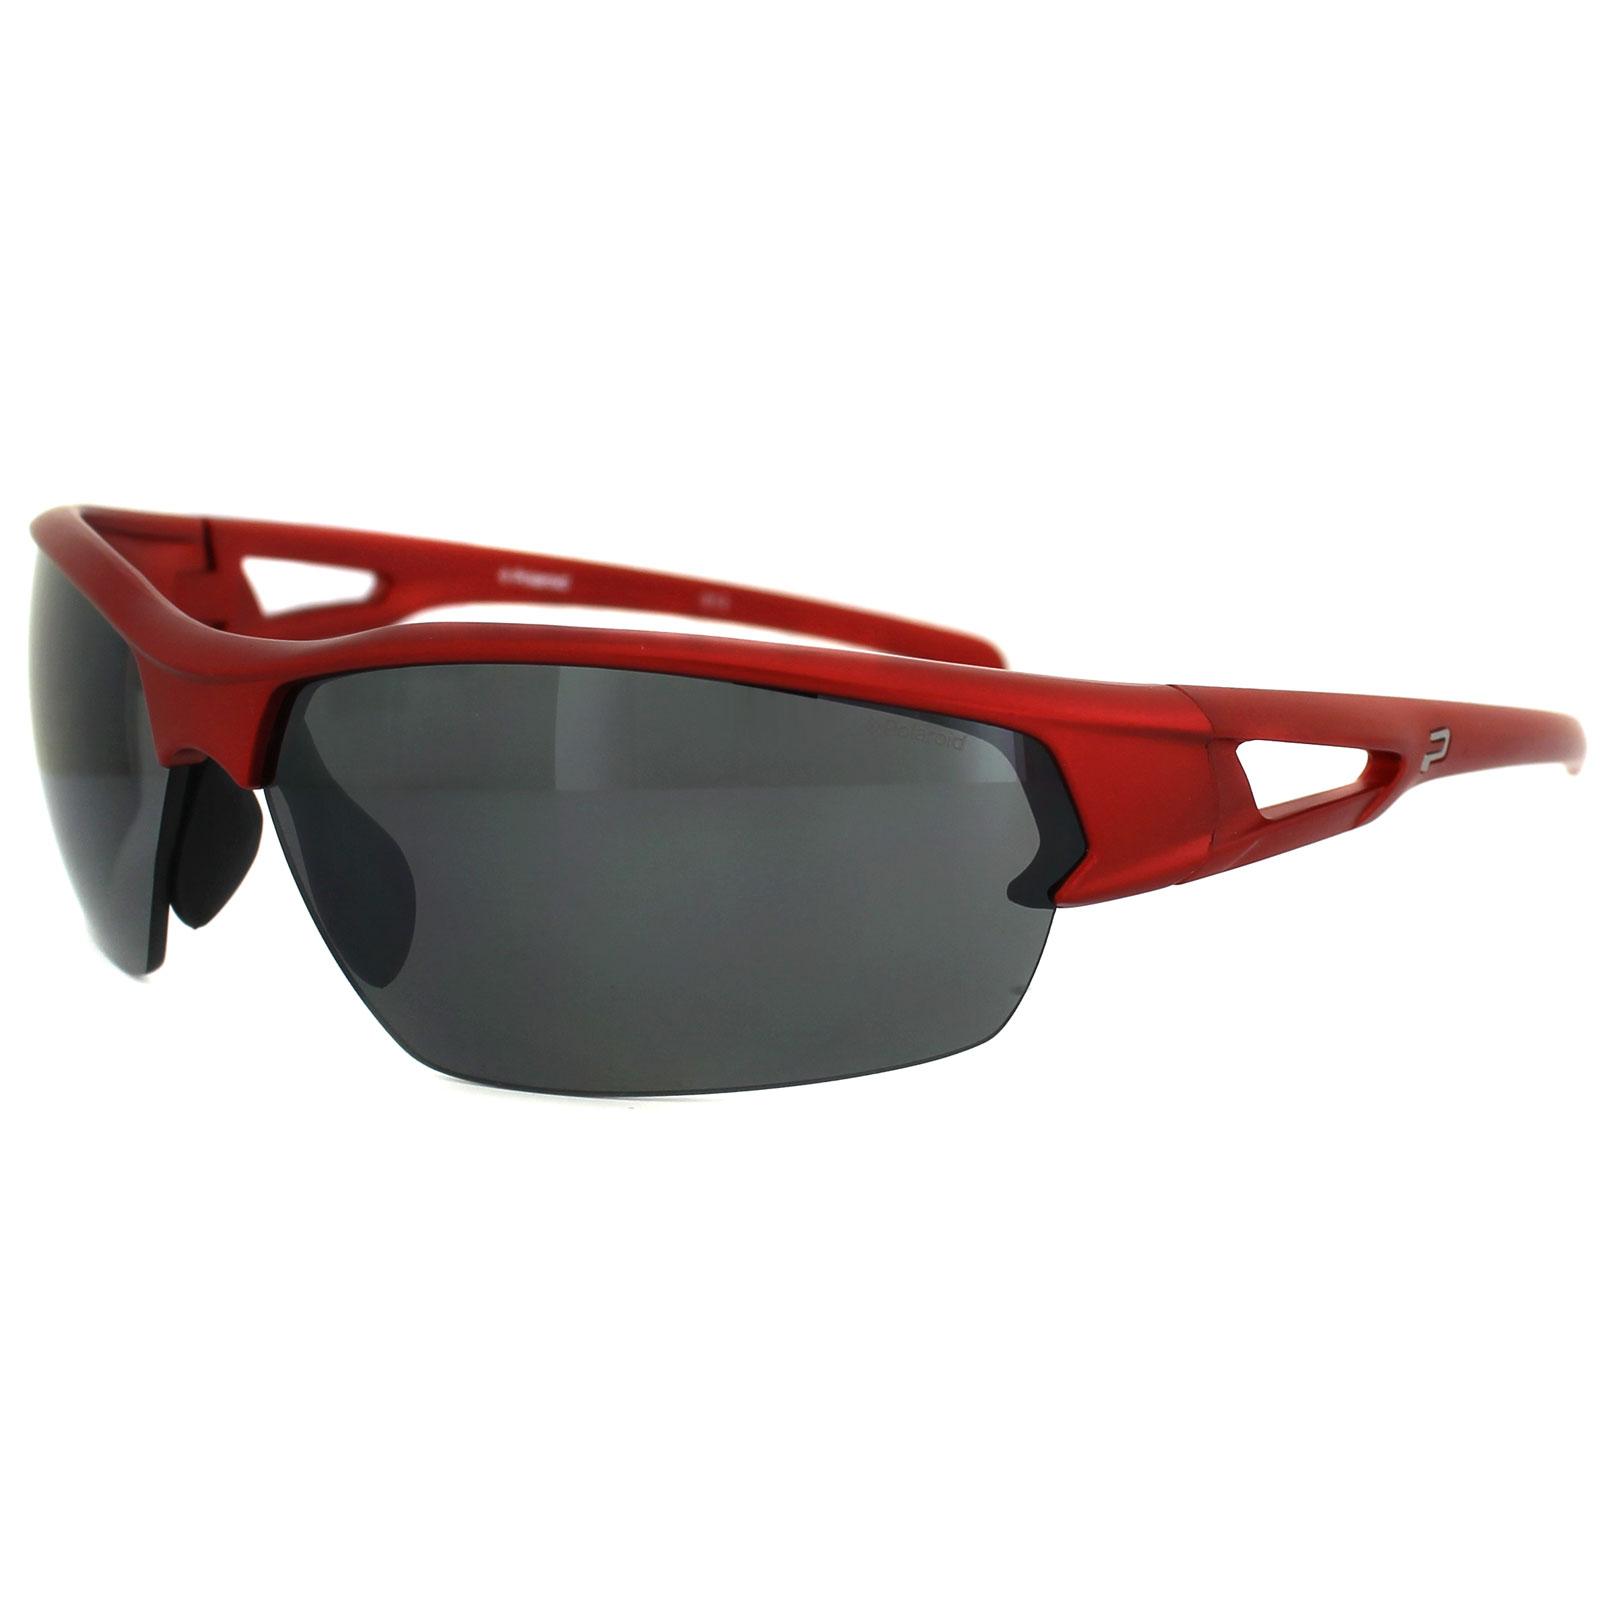 3698572f8ad4 Sentinel Polaroid Sport Sunglasses P7329 33W JB Shiny Red Grey Silver  Mirror Polarized